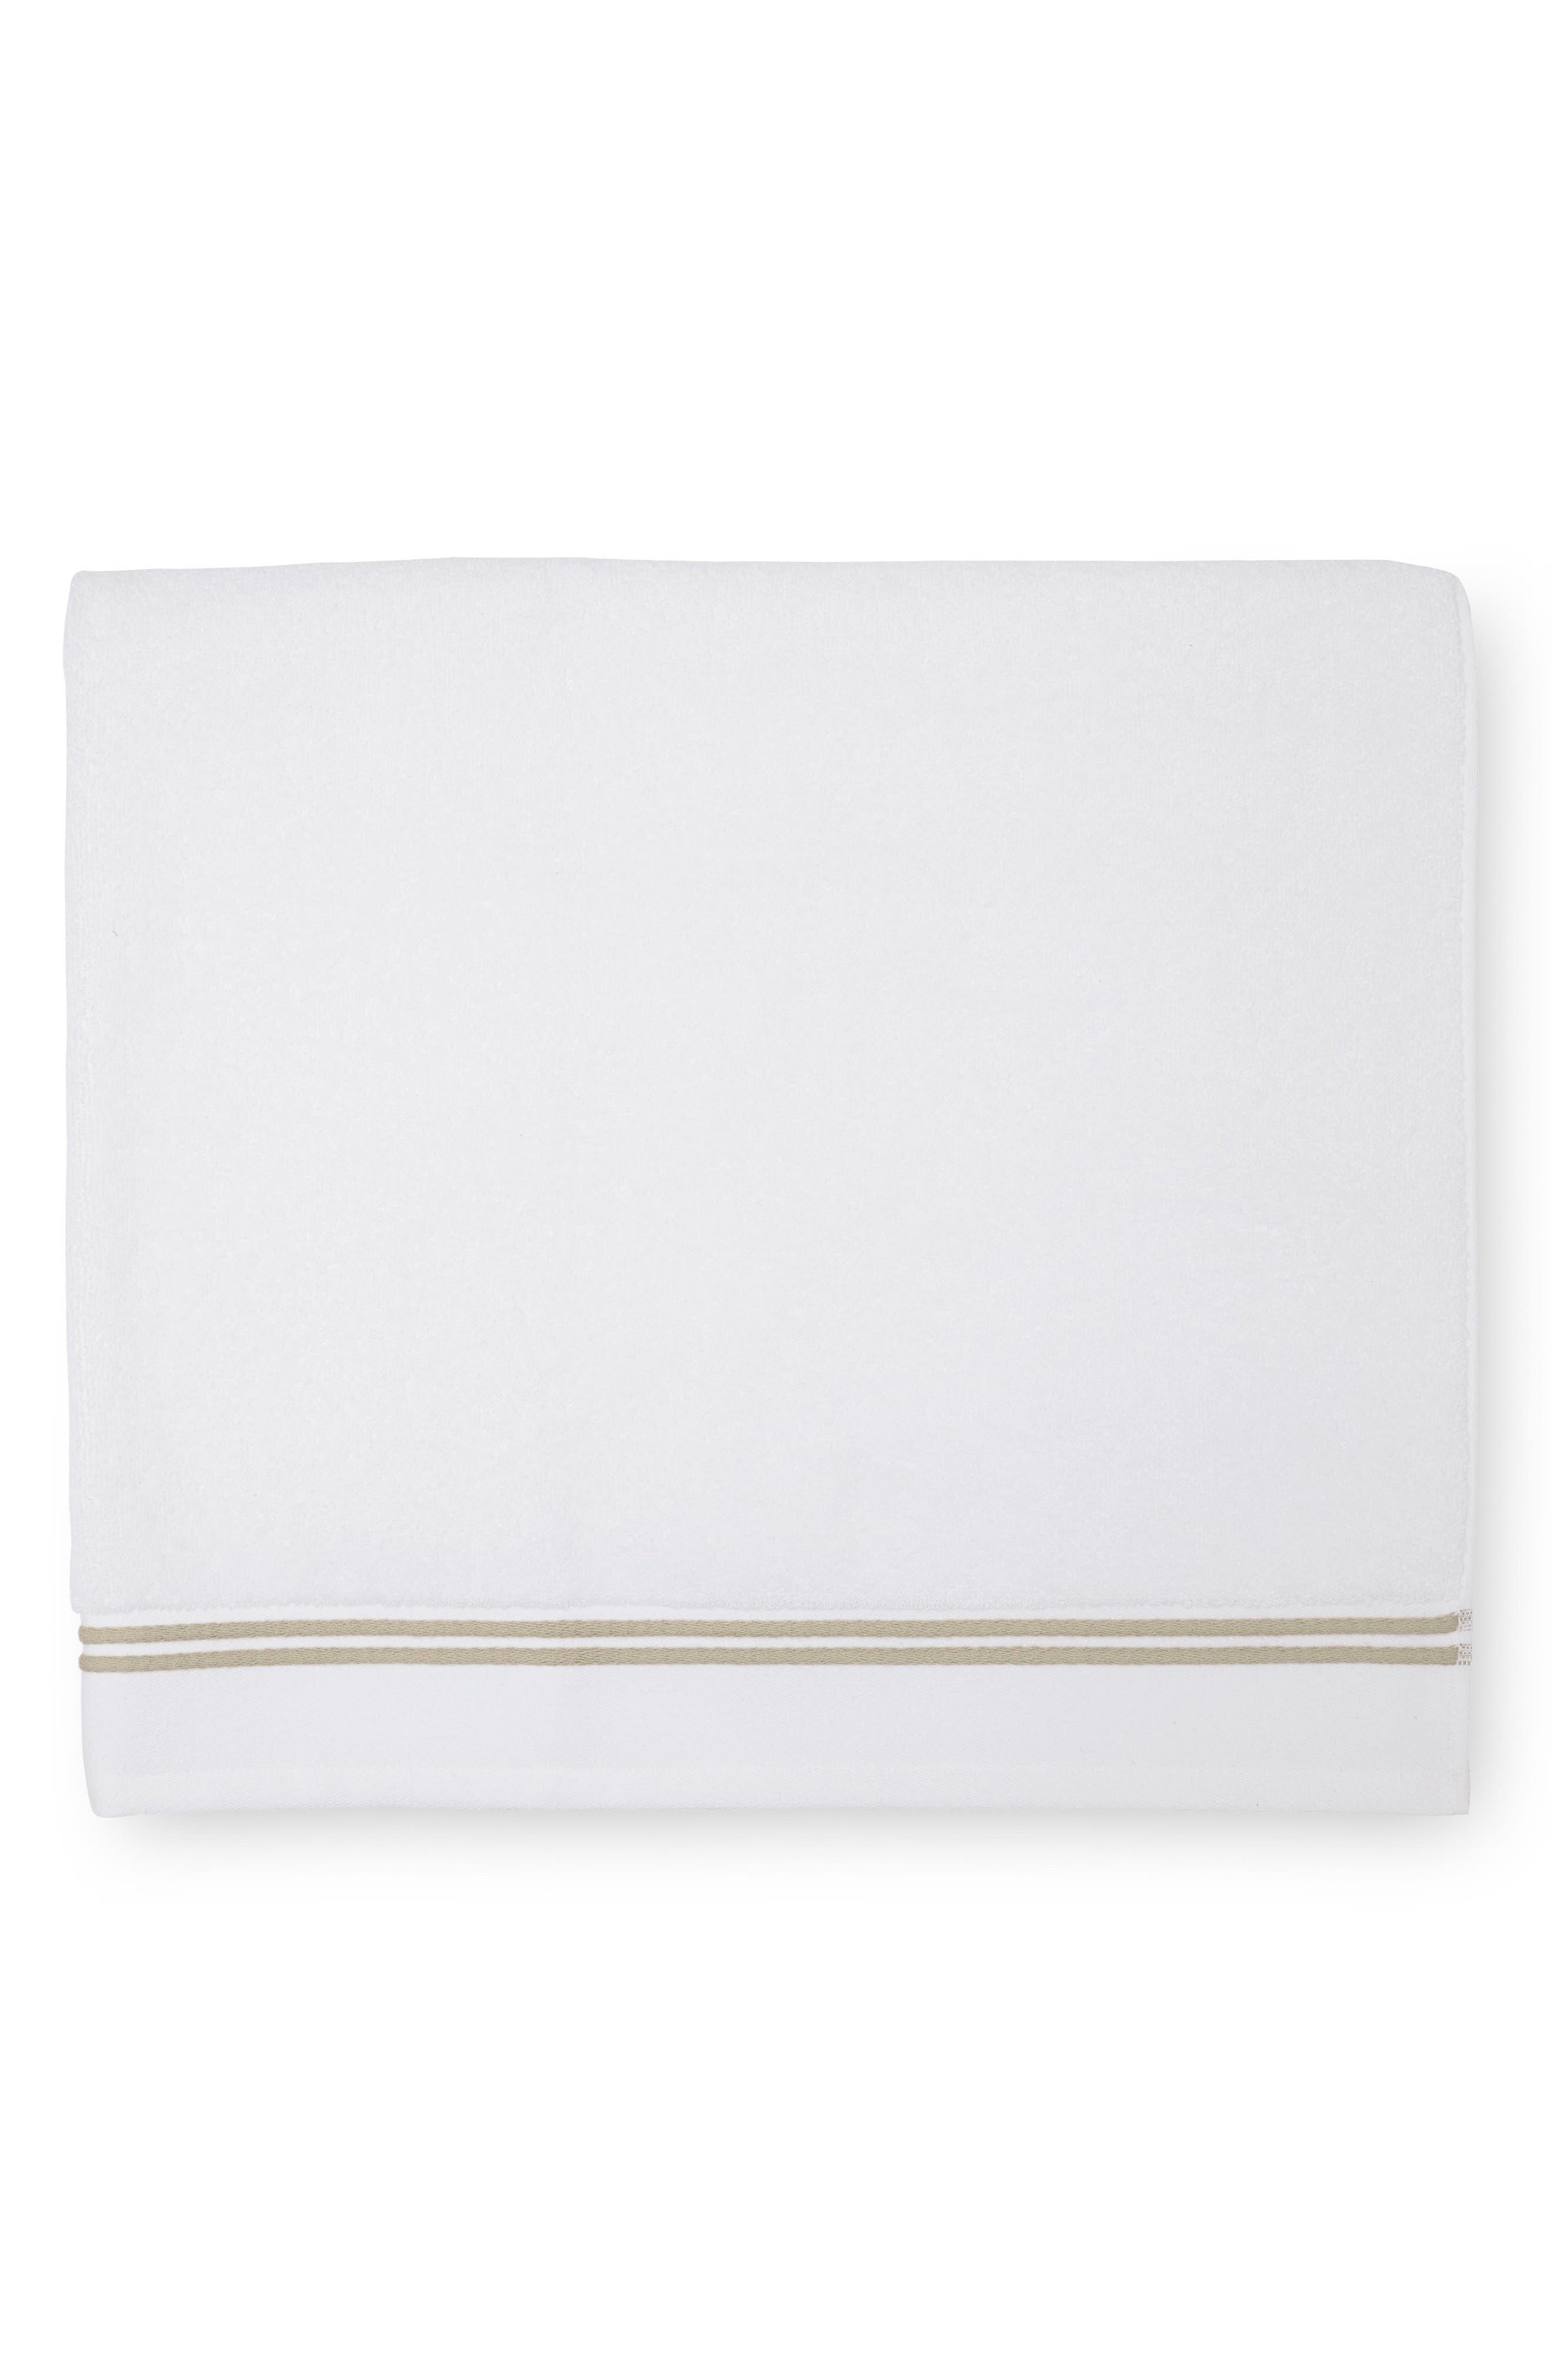 SFERRA Aura Bath Sheet, Main, color, 100